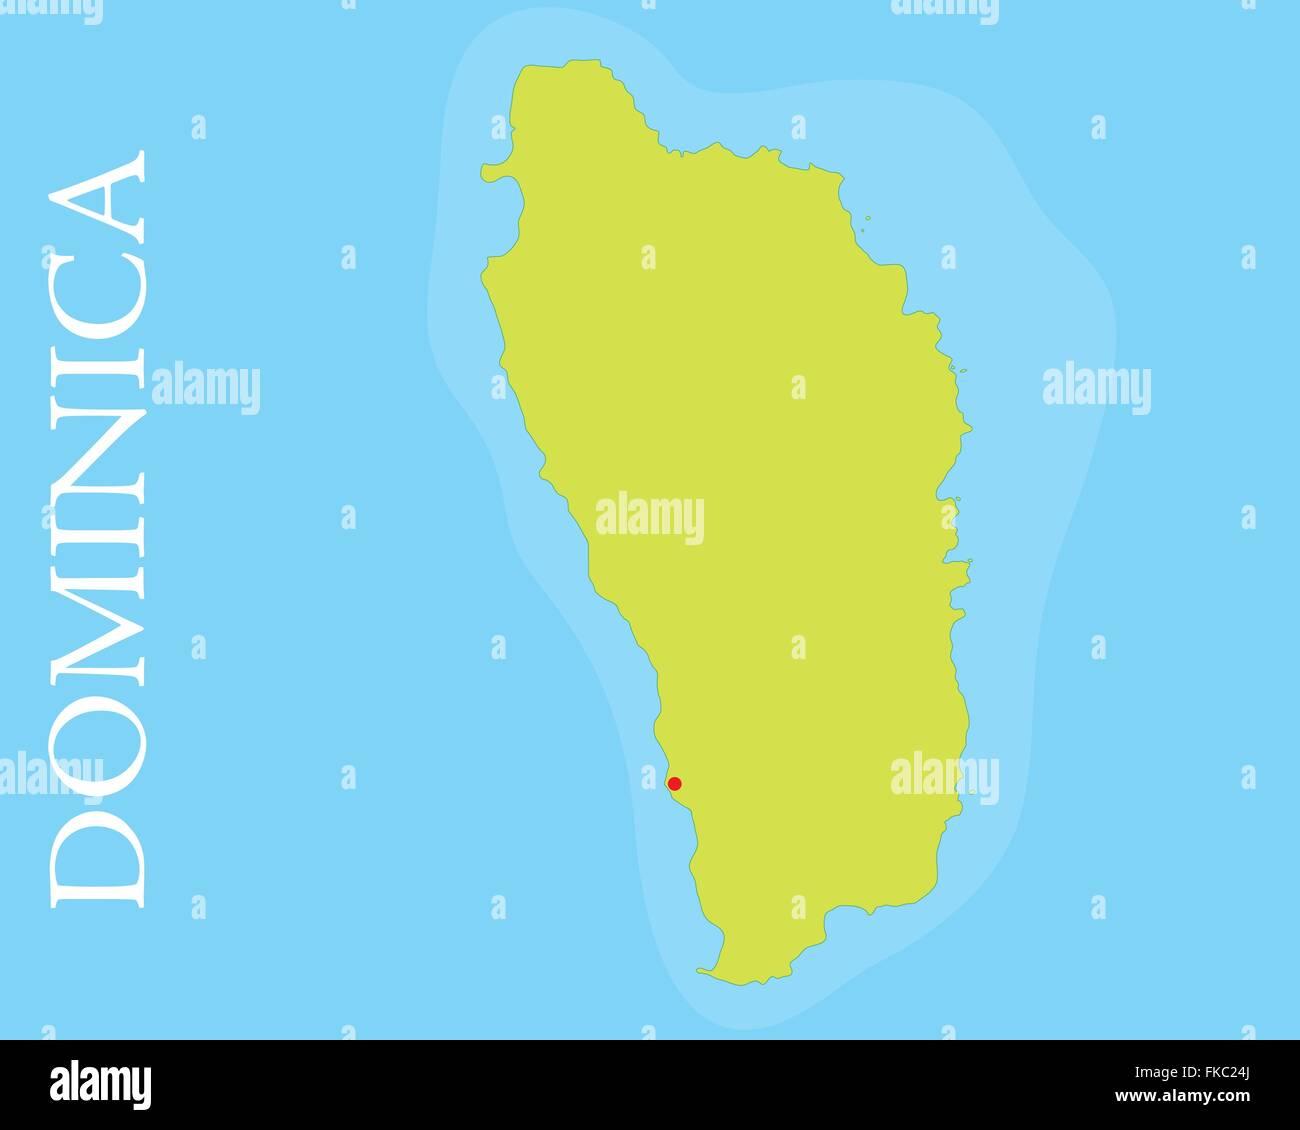 Map of Dominica island, Caribbean Sea Stock Vector Art ...